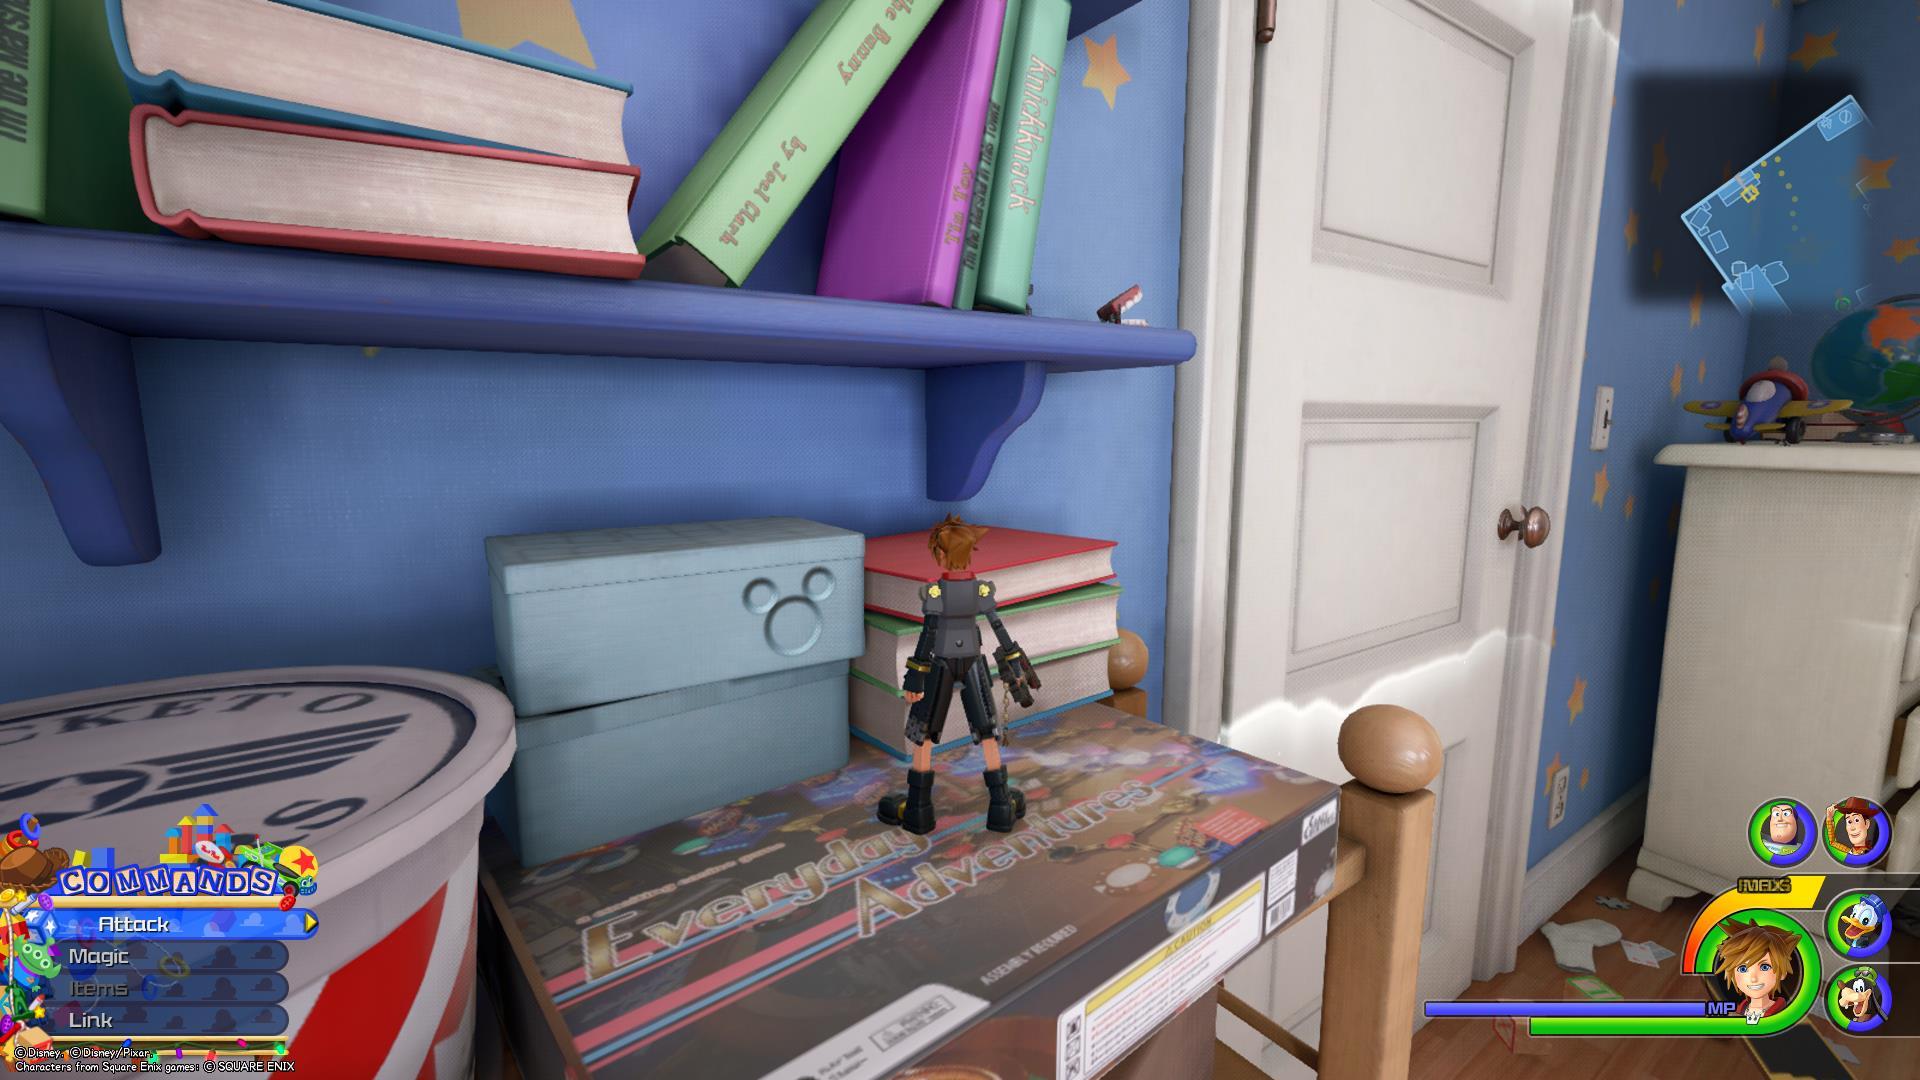 Kingdom Hearts 3 - Toy Box Lucky Emblem 1